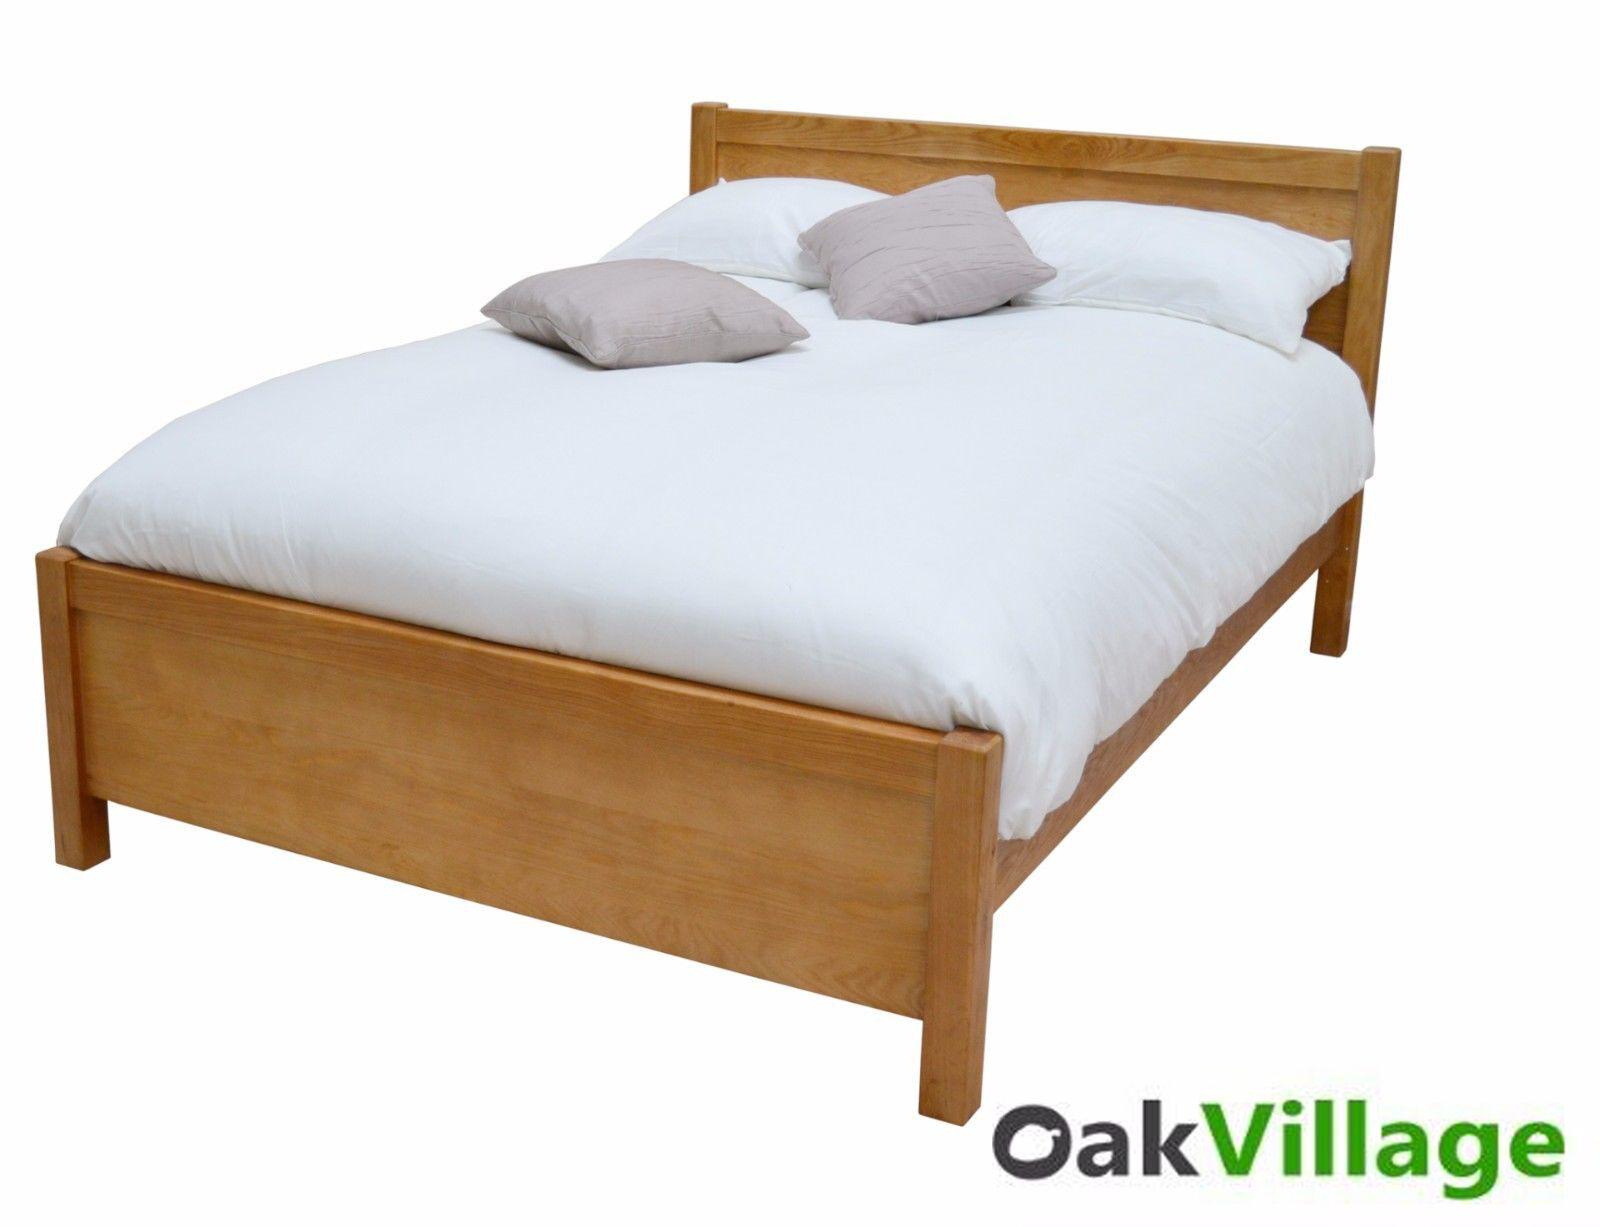 Picture of: Oak Super King Bed Solid Wood 6ft Super Kingsize Bed Frame New Wellow 4963533152379 Ebay